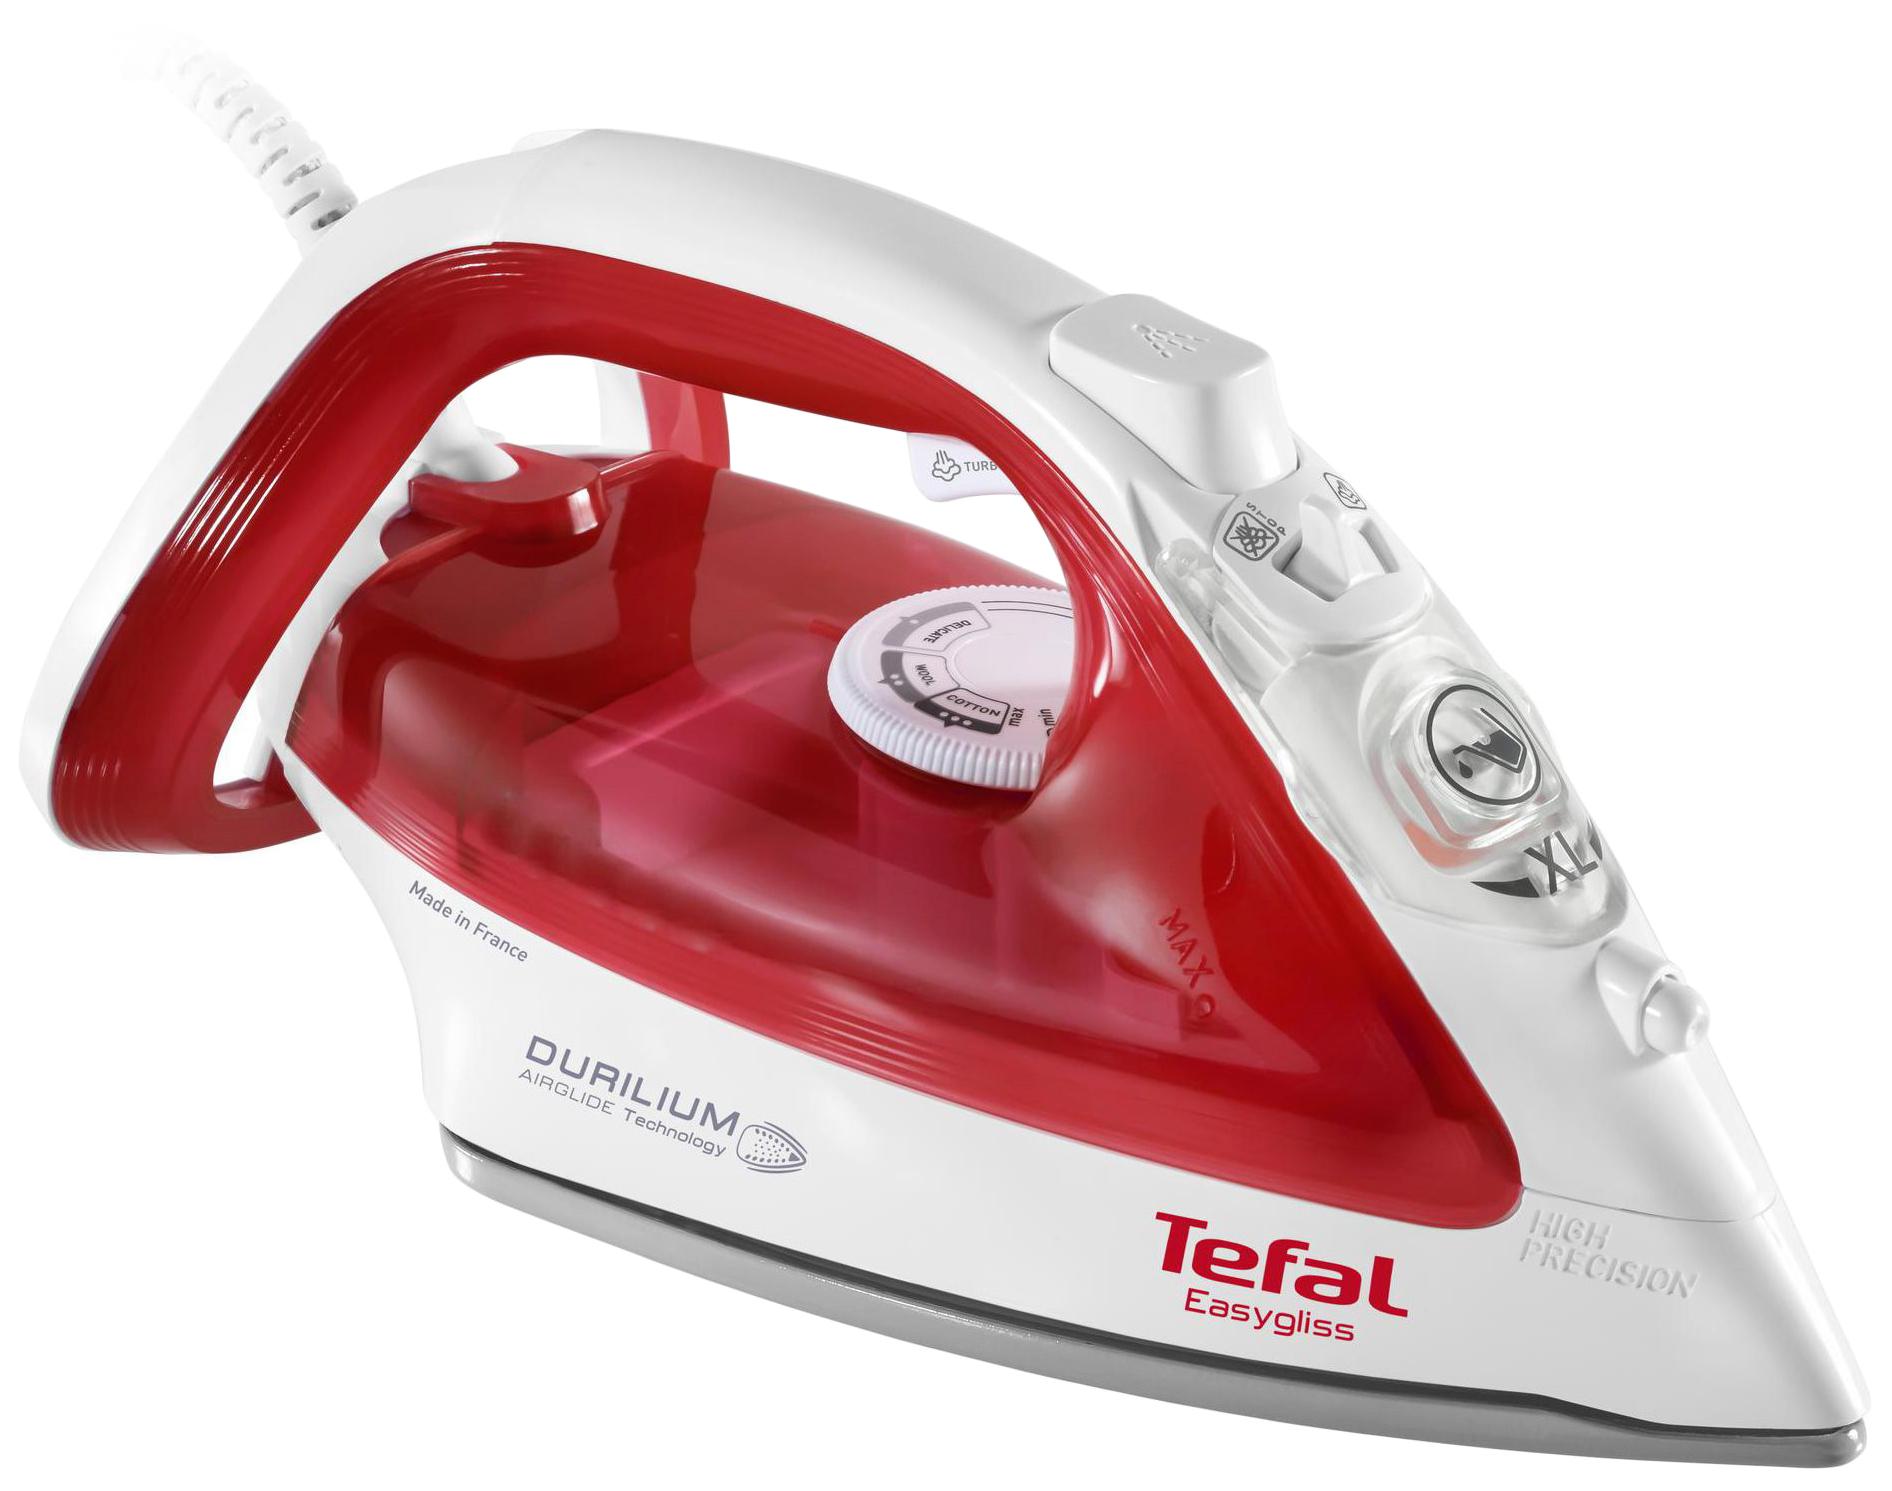 Утюг Tefal Easygliss FV3962 White/Red